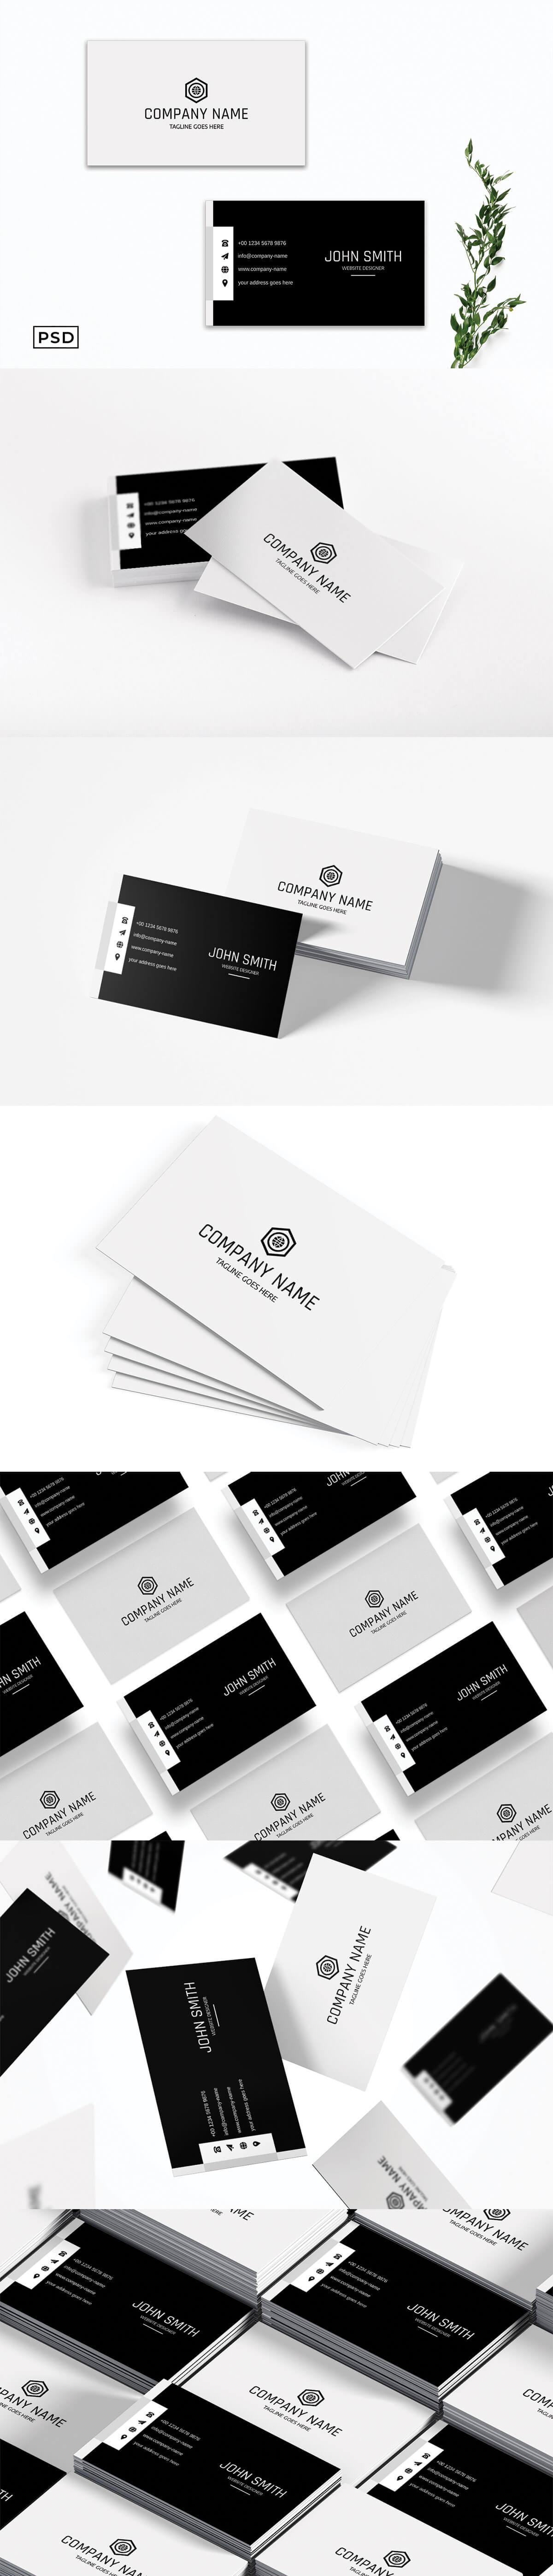 Free Elegant Minimalist Business Card Template